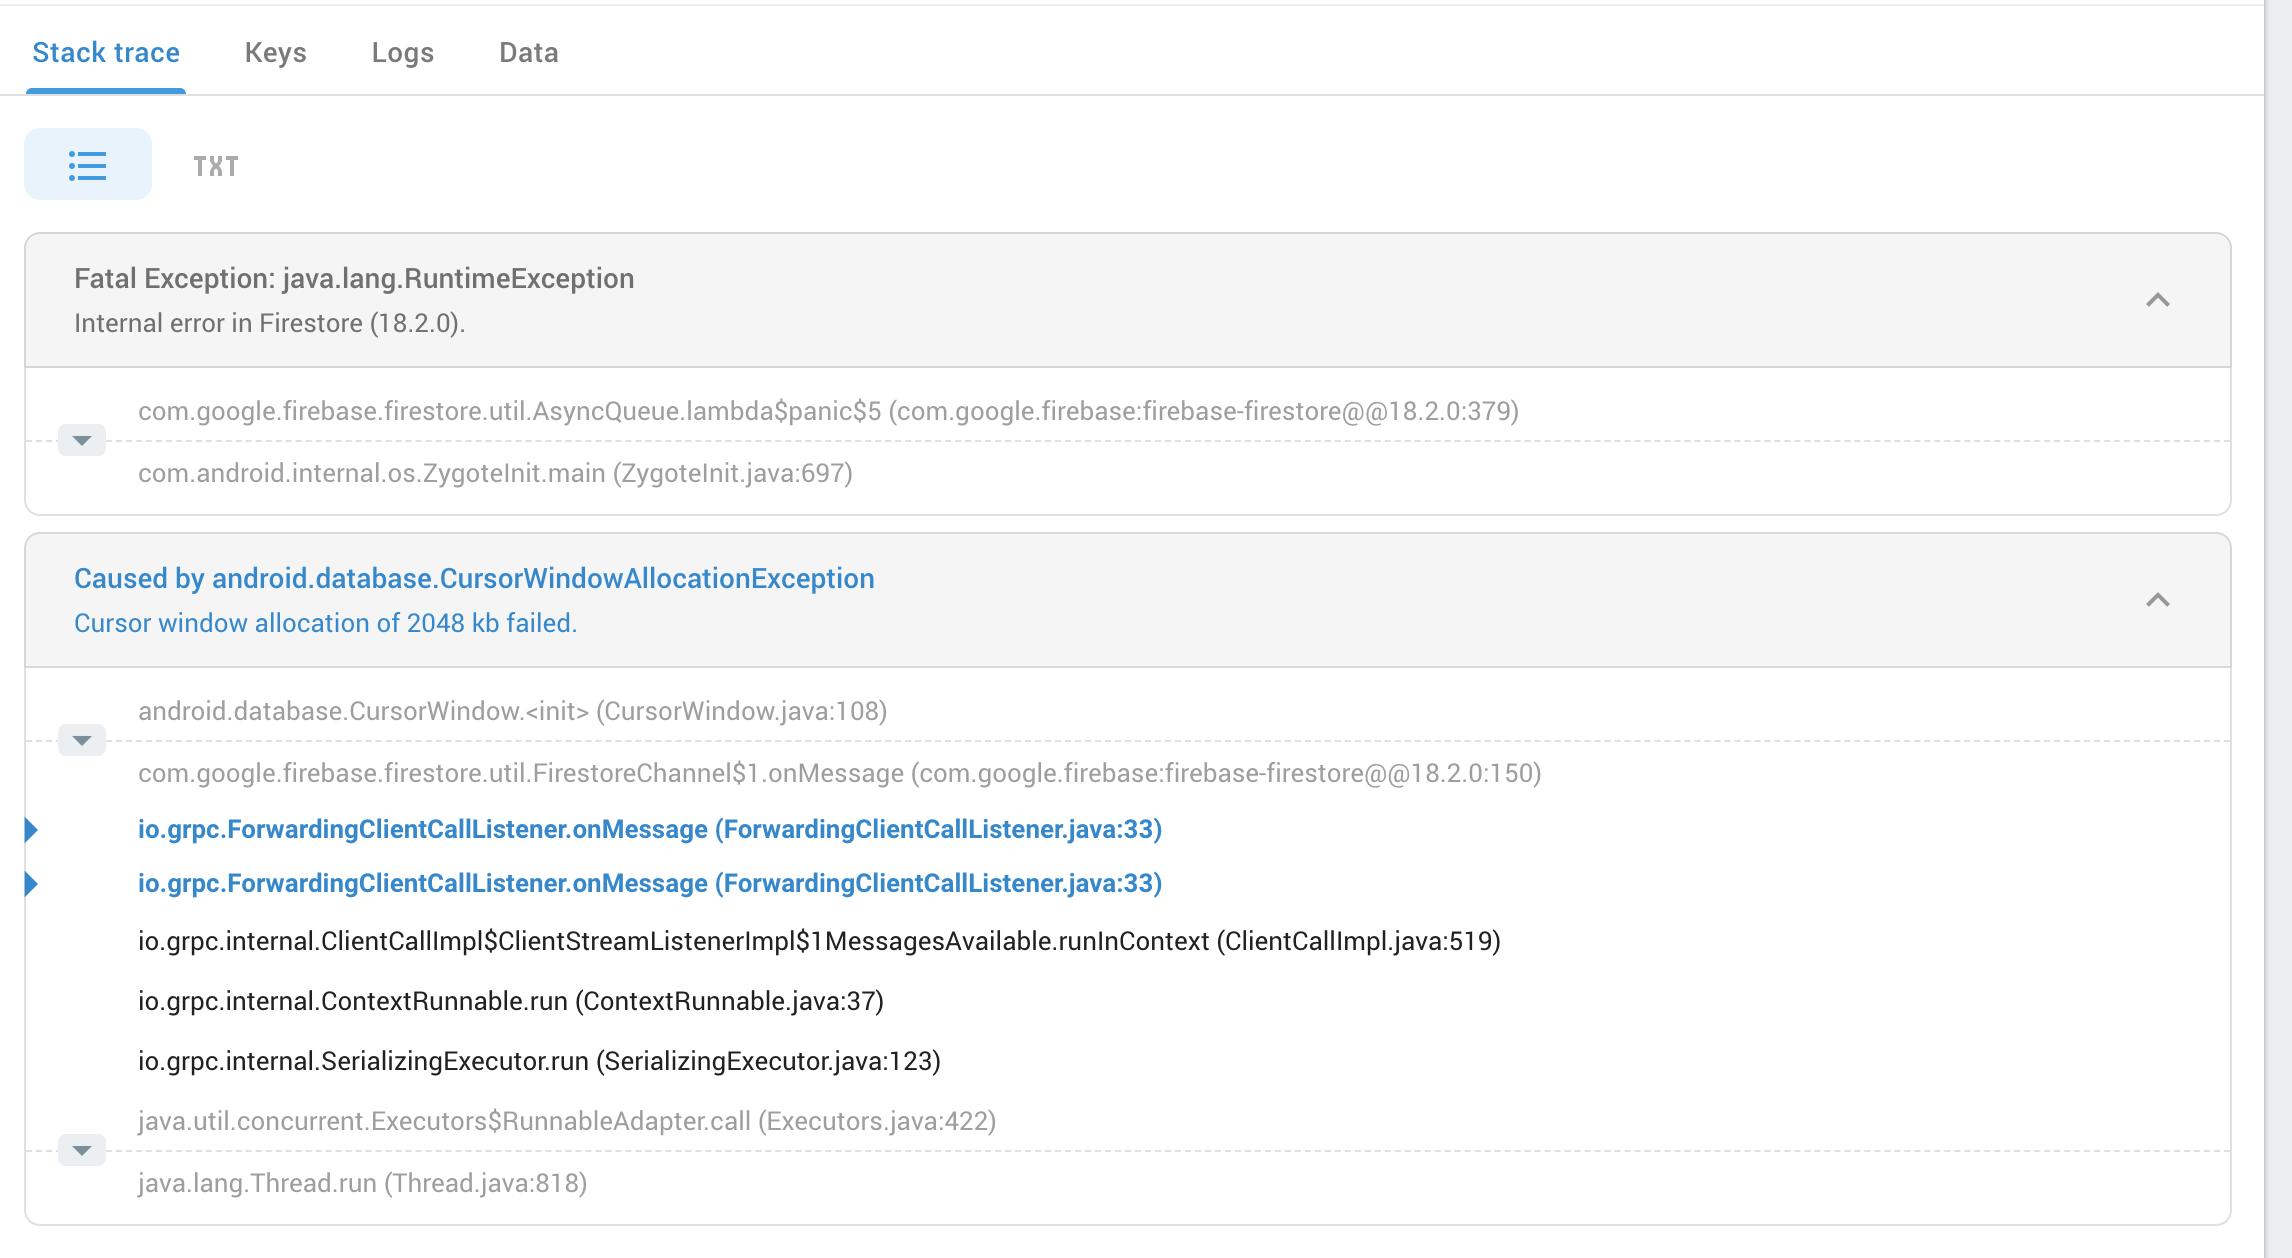 firebase/firestore: getting internal error from AsyncQueue · Issue